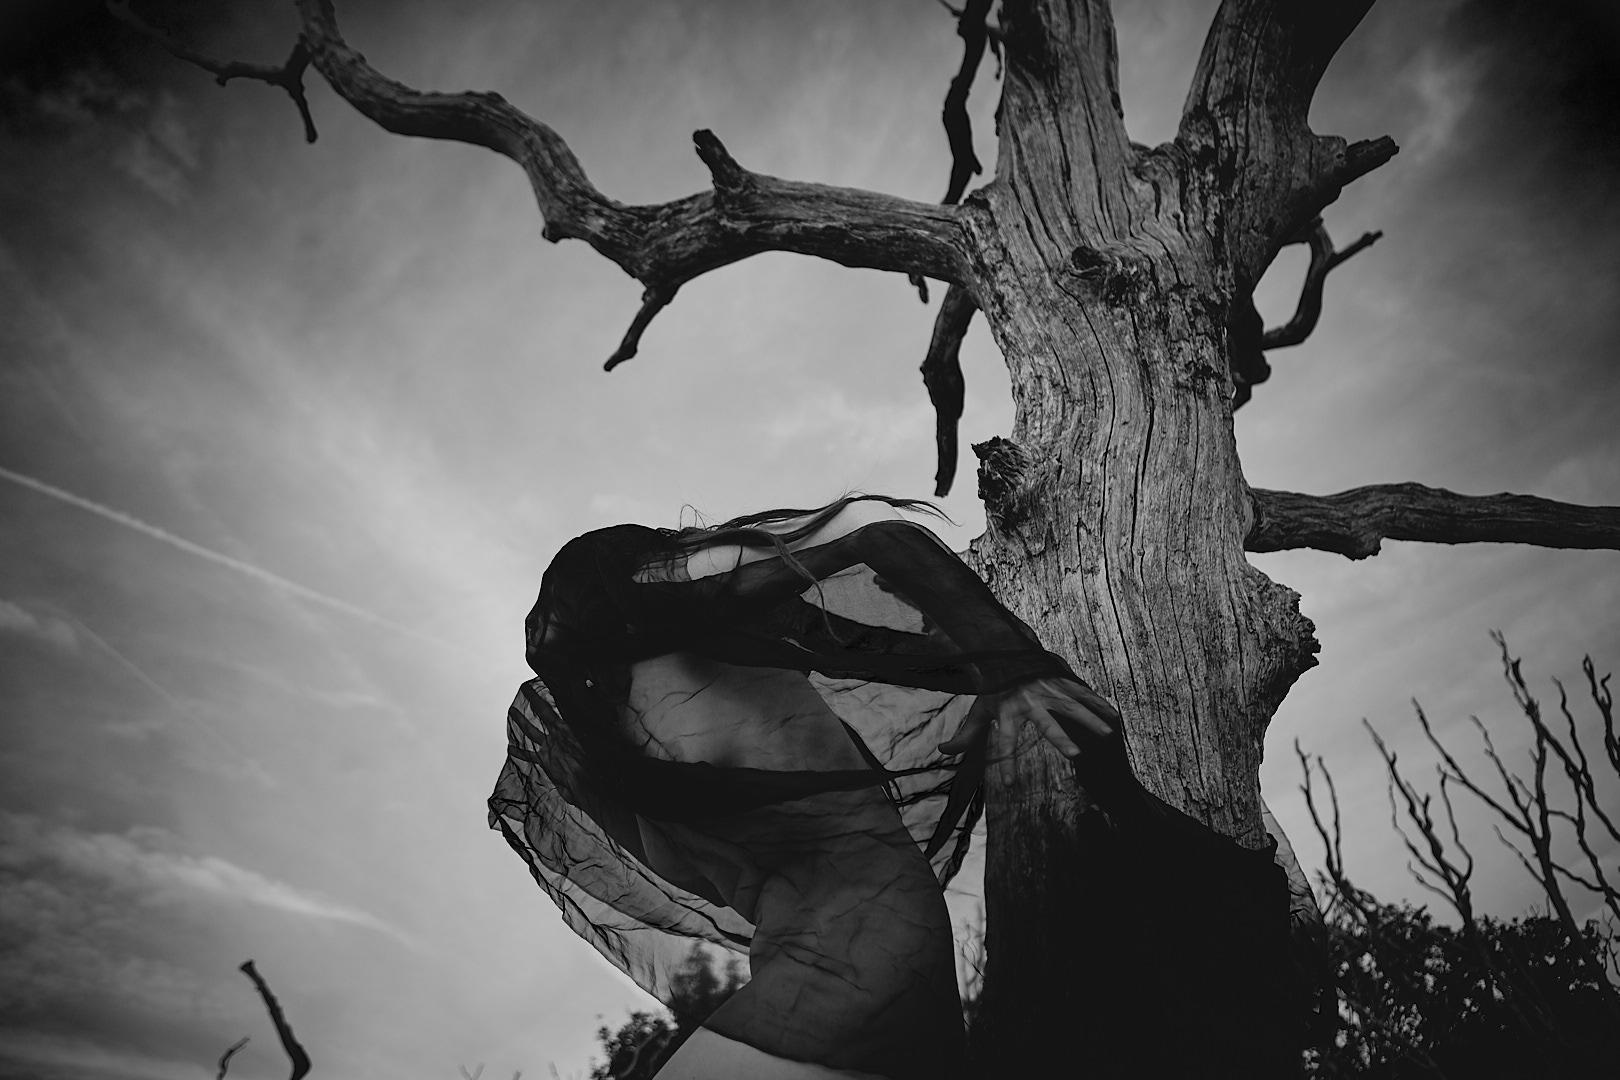 Photo by Konstantin Alexandroff